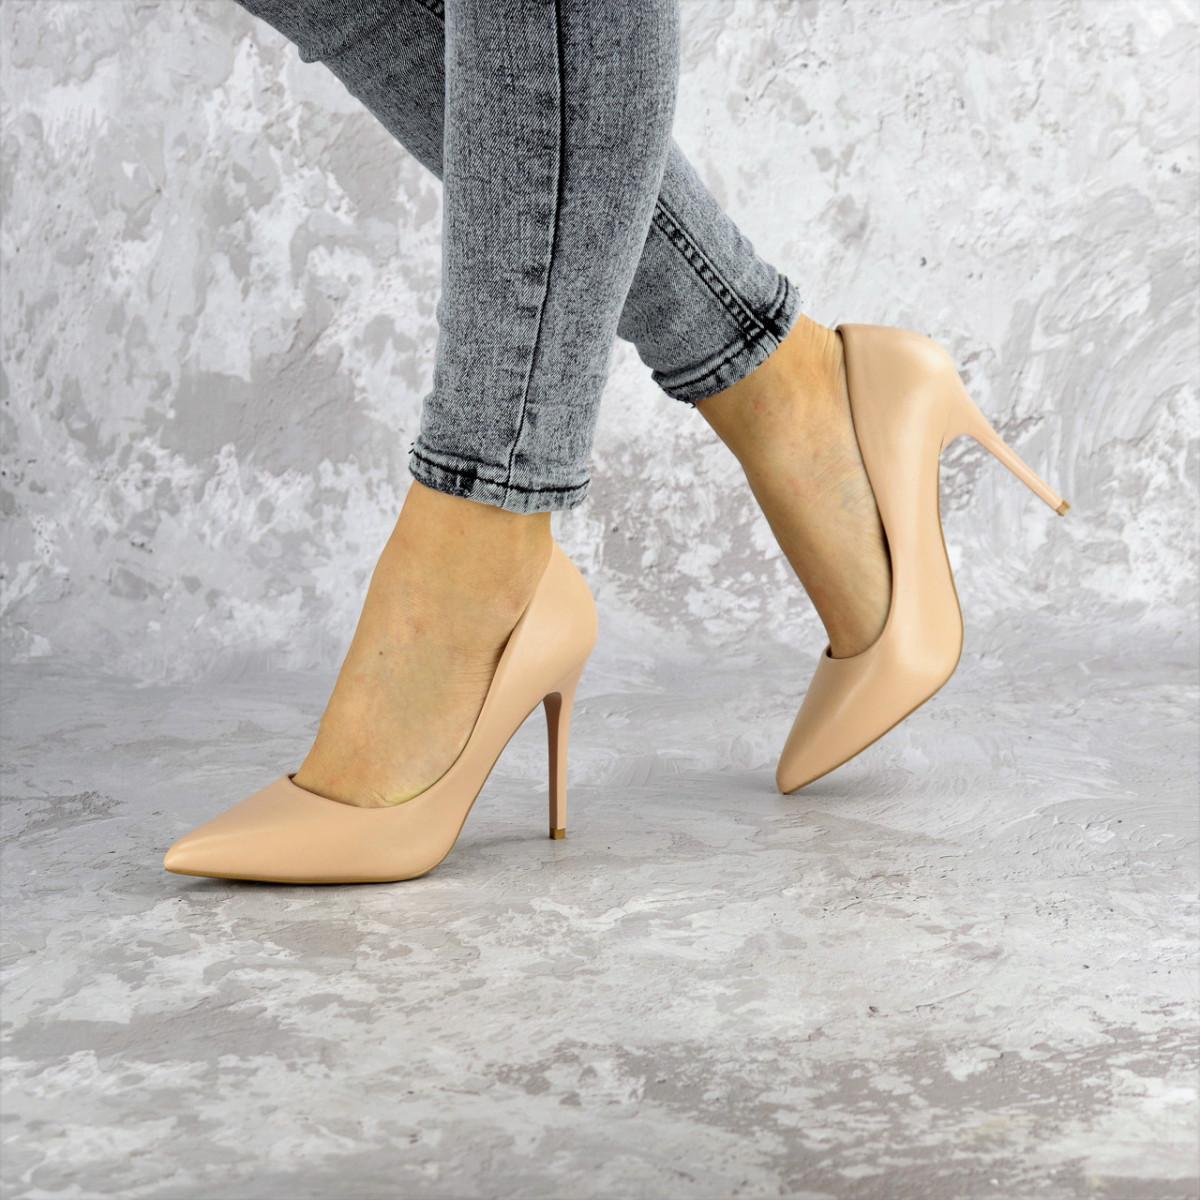 Туфли женские на каблуке Fashion Fleetwood 2367 36 размер 23,5 см Бежевый